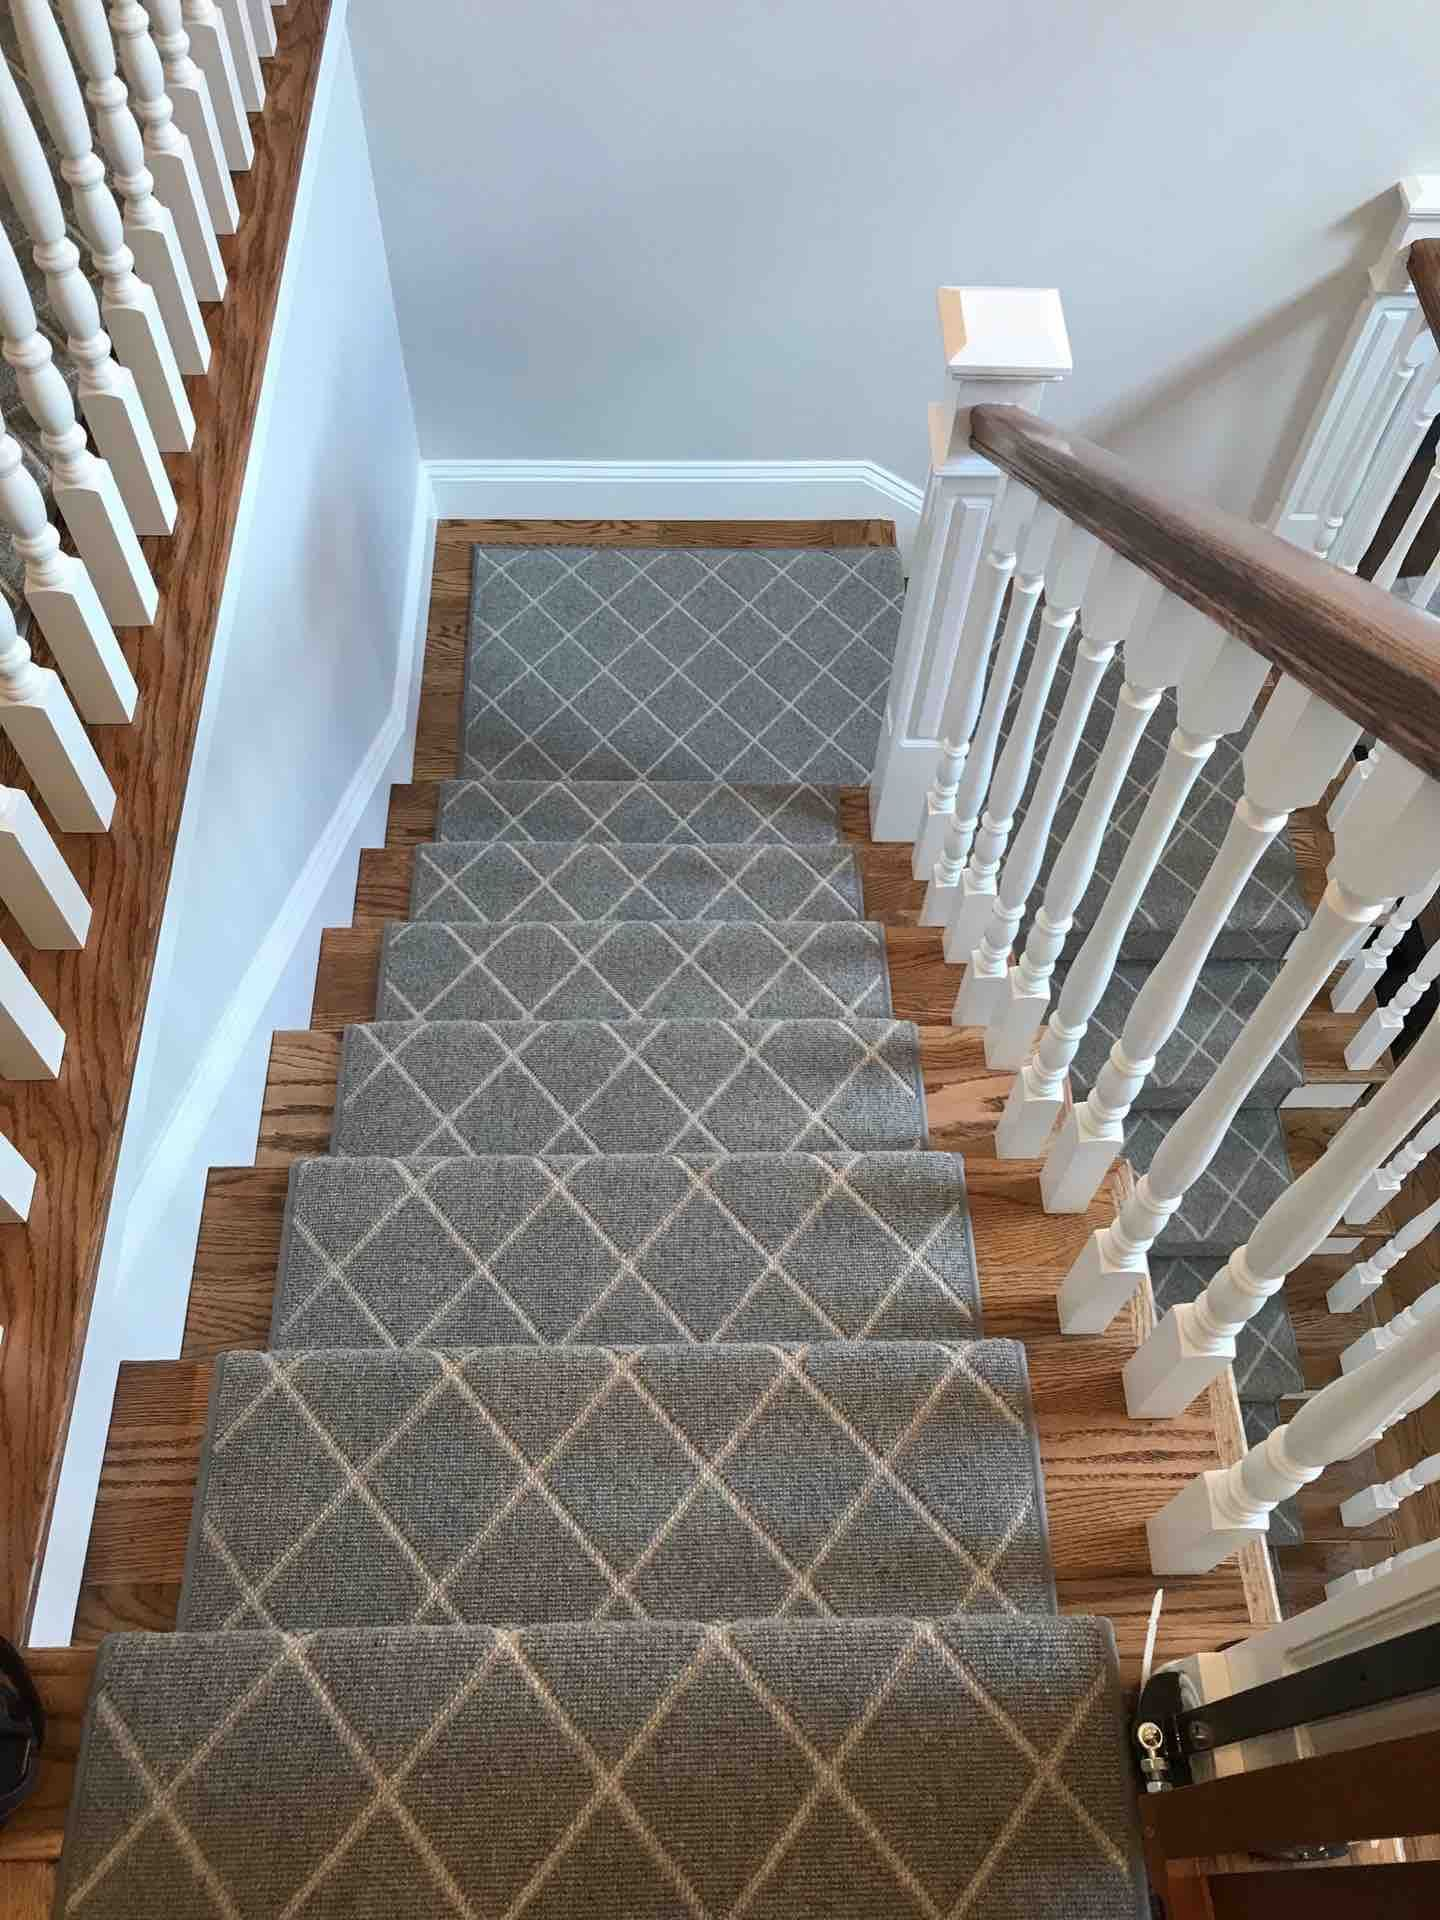 Astro Moondust A Beautiful Flatweave Installation By The Carpet Workroom Stair Runner Carpet Carpet Stairs Stair Runner